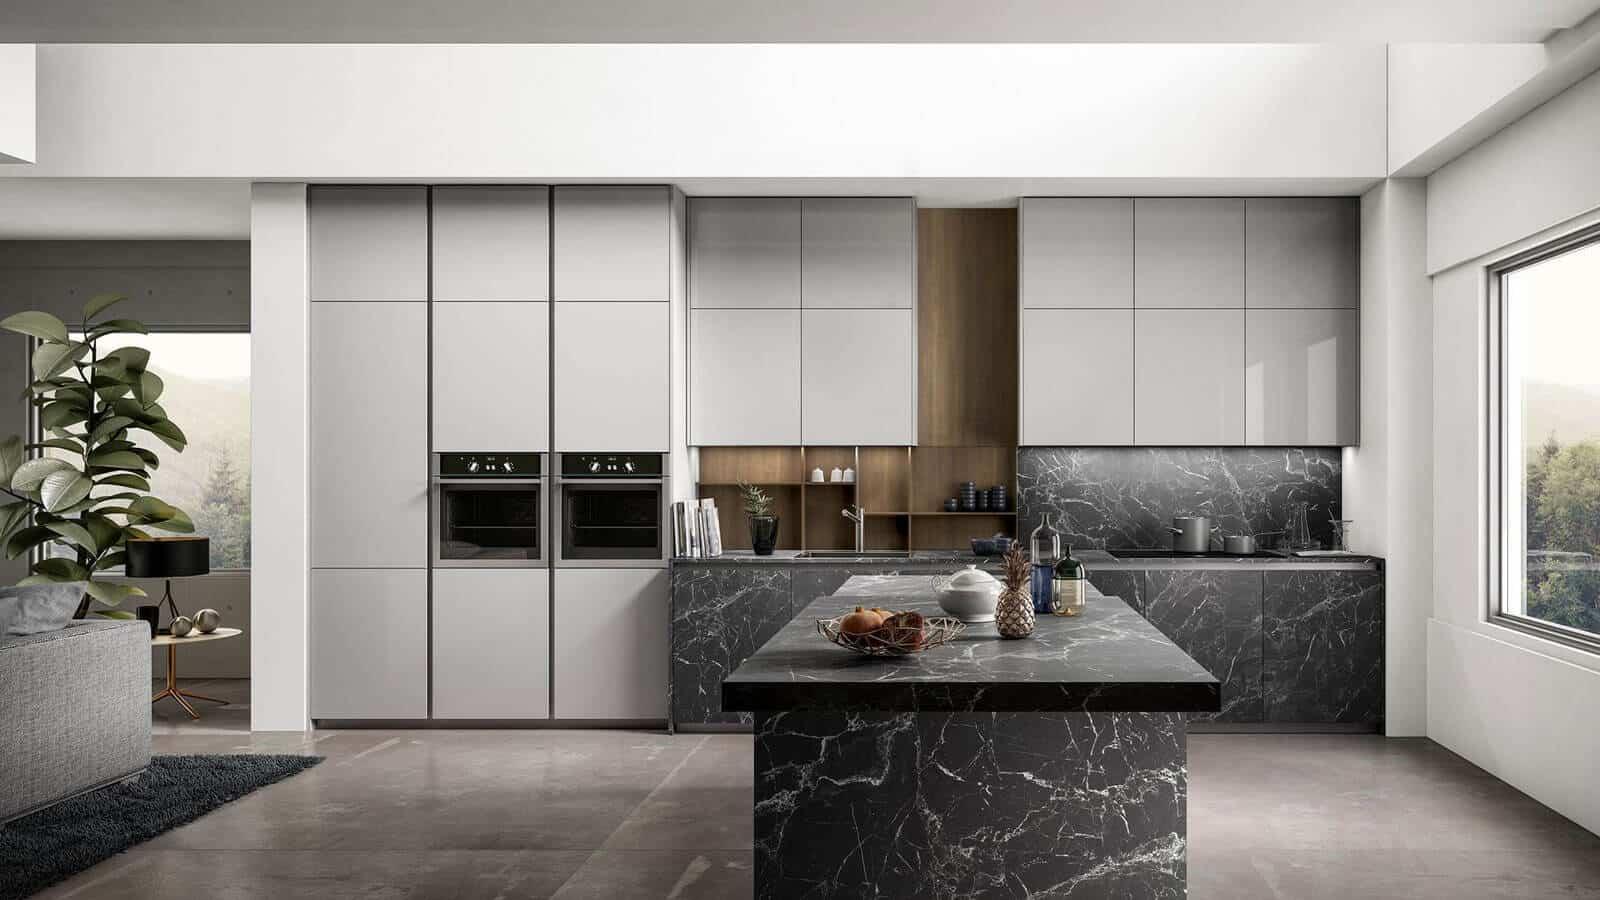 Cuisine Design Optimal Cuisines Interieurs Annecy Epagny